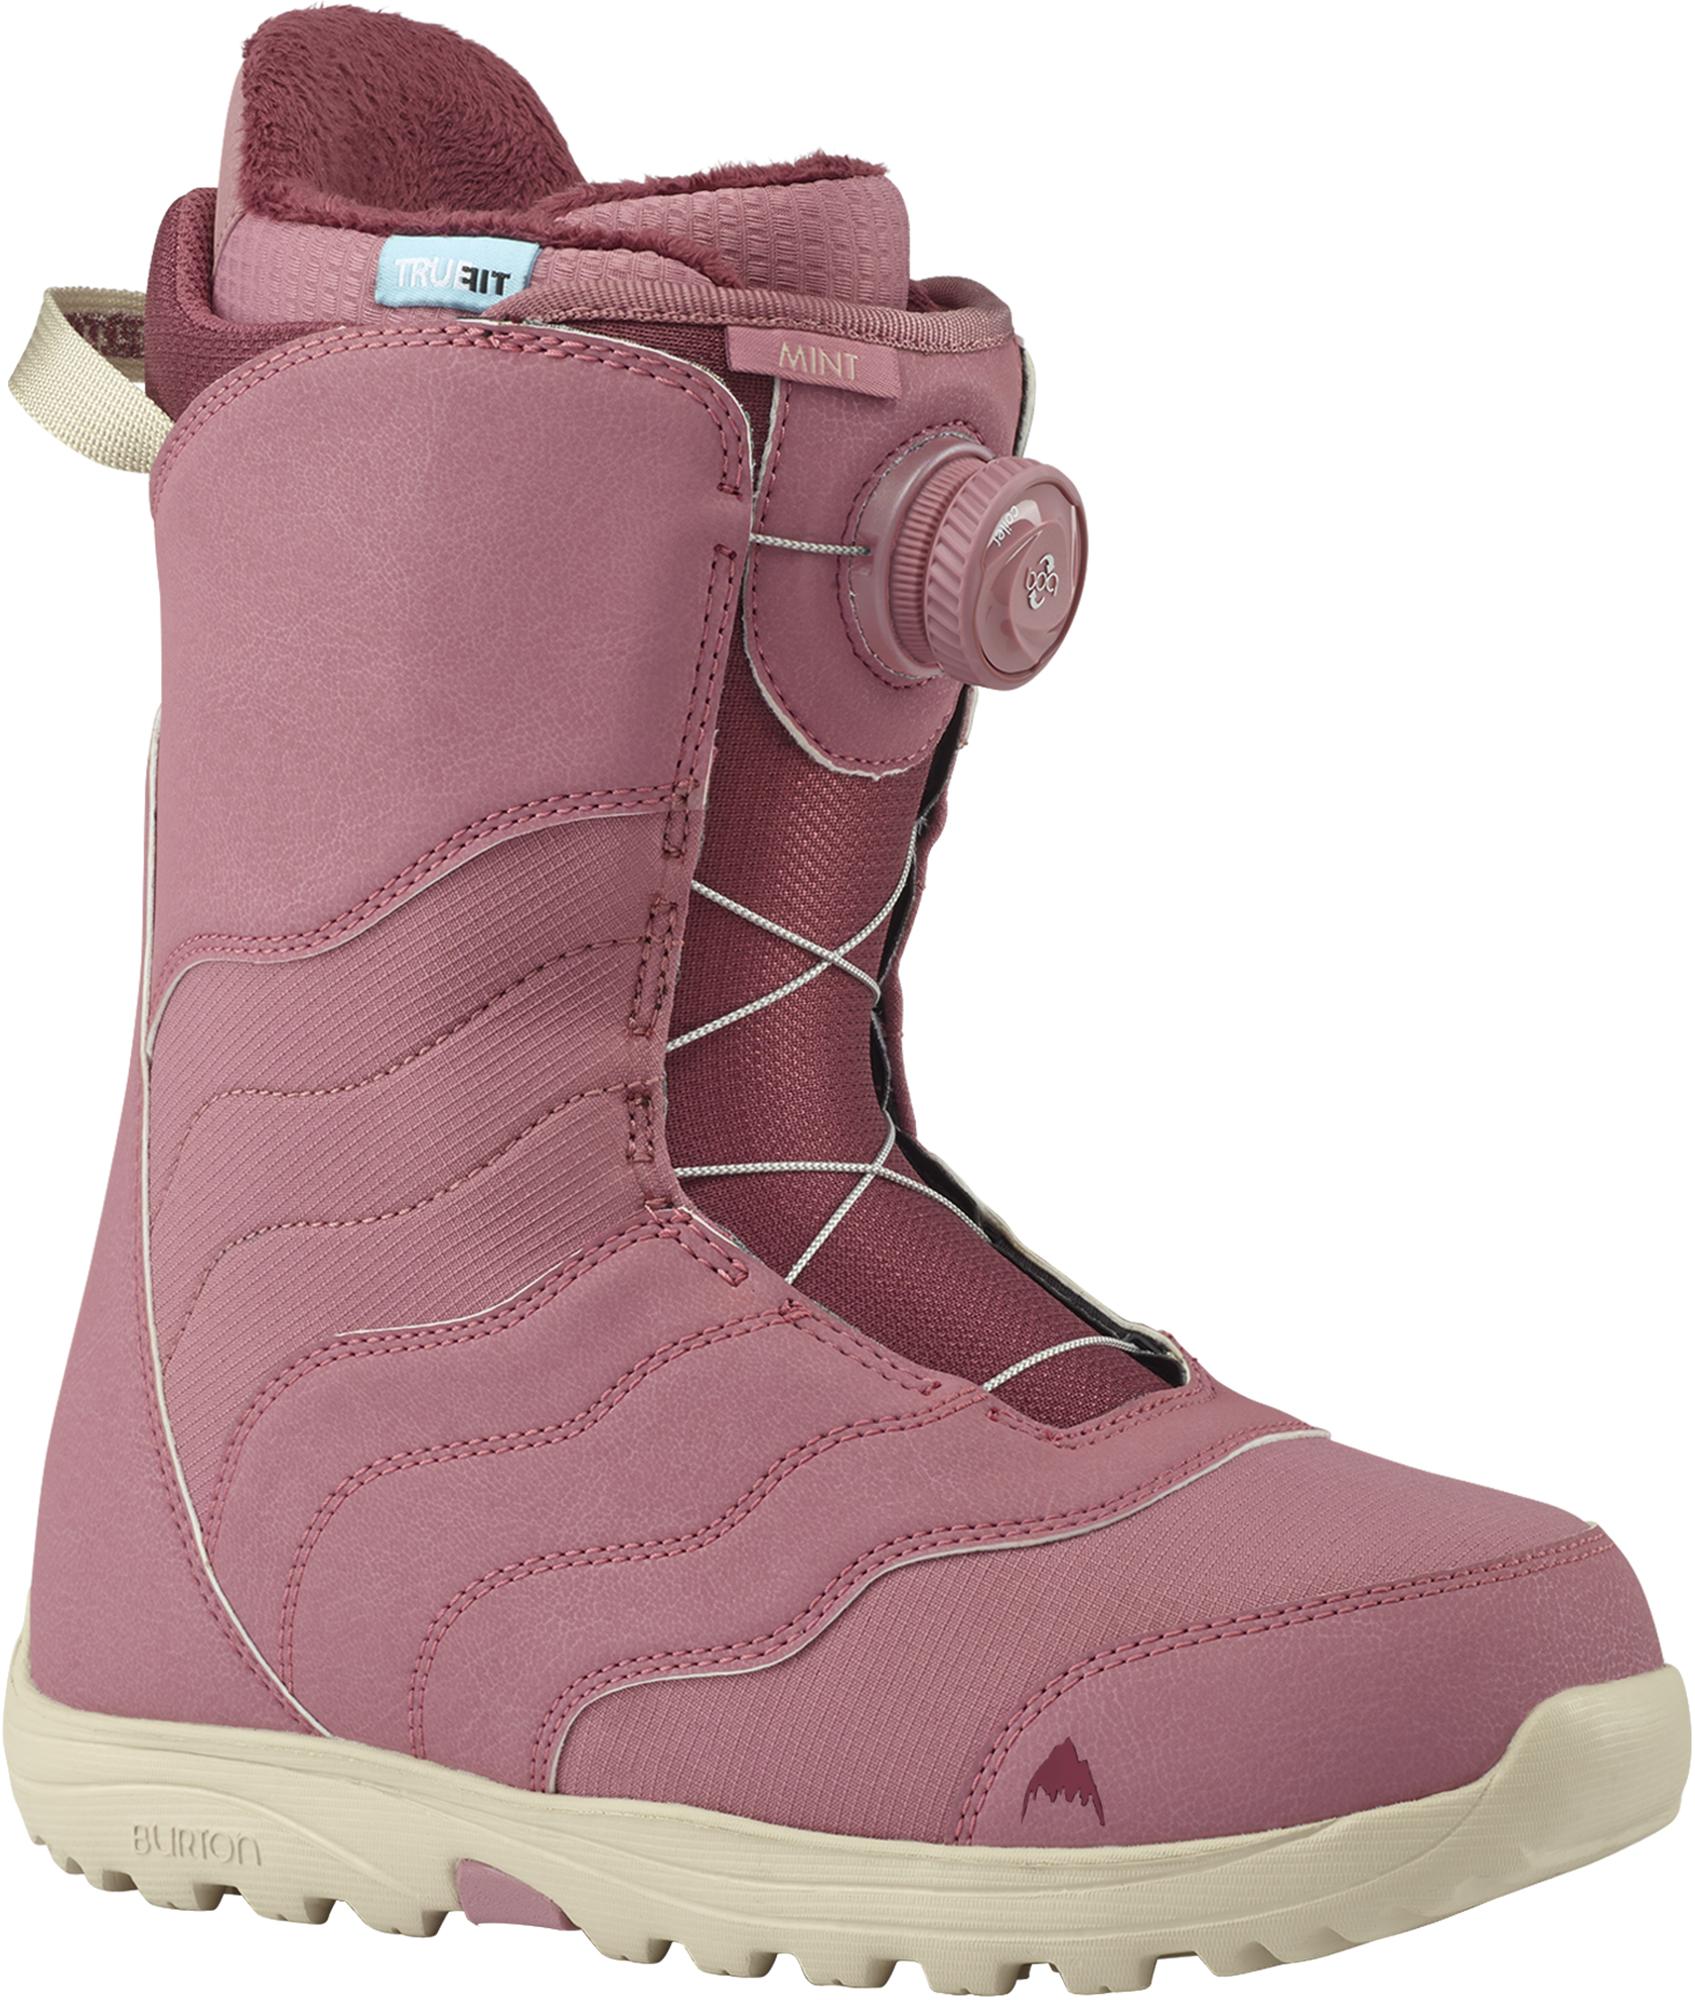 Burton Сноубордические ботинки женские Burton Mint Boa, размер 38,5 цены онлайн